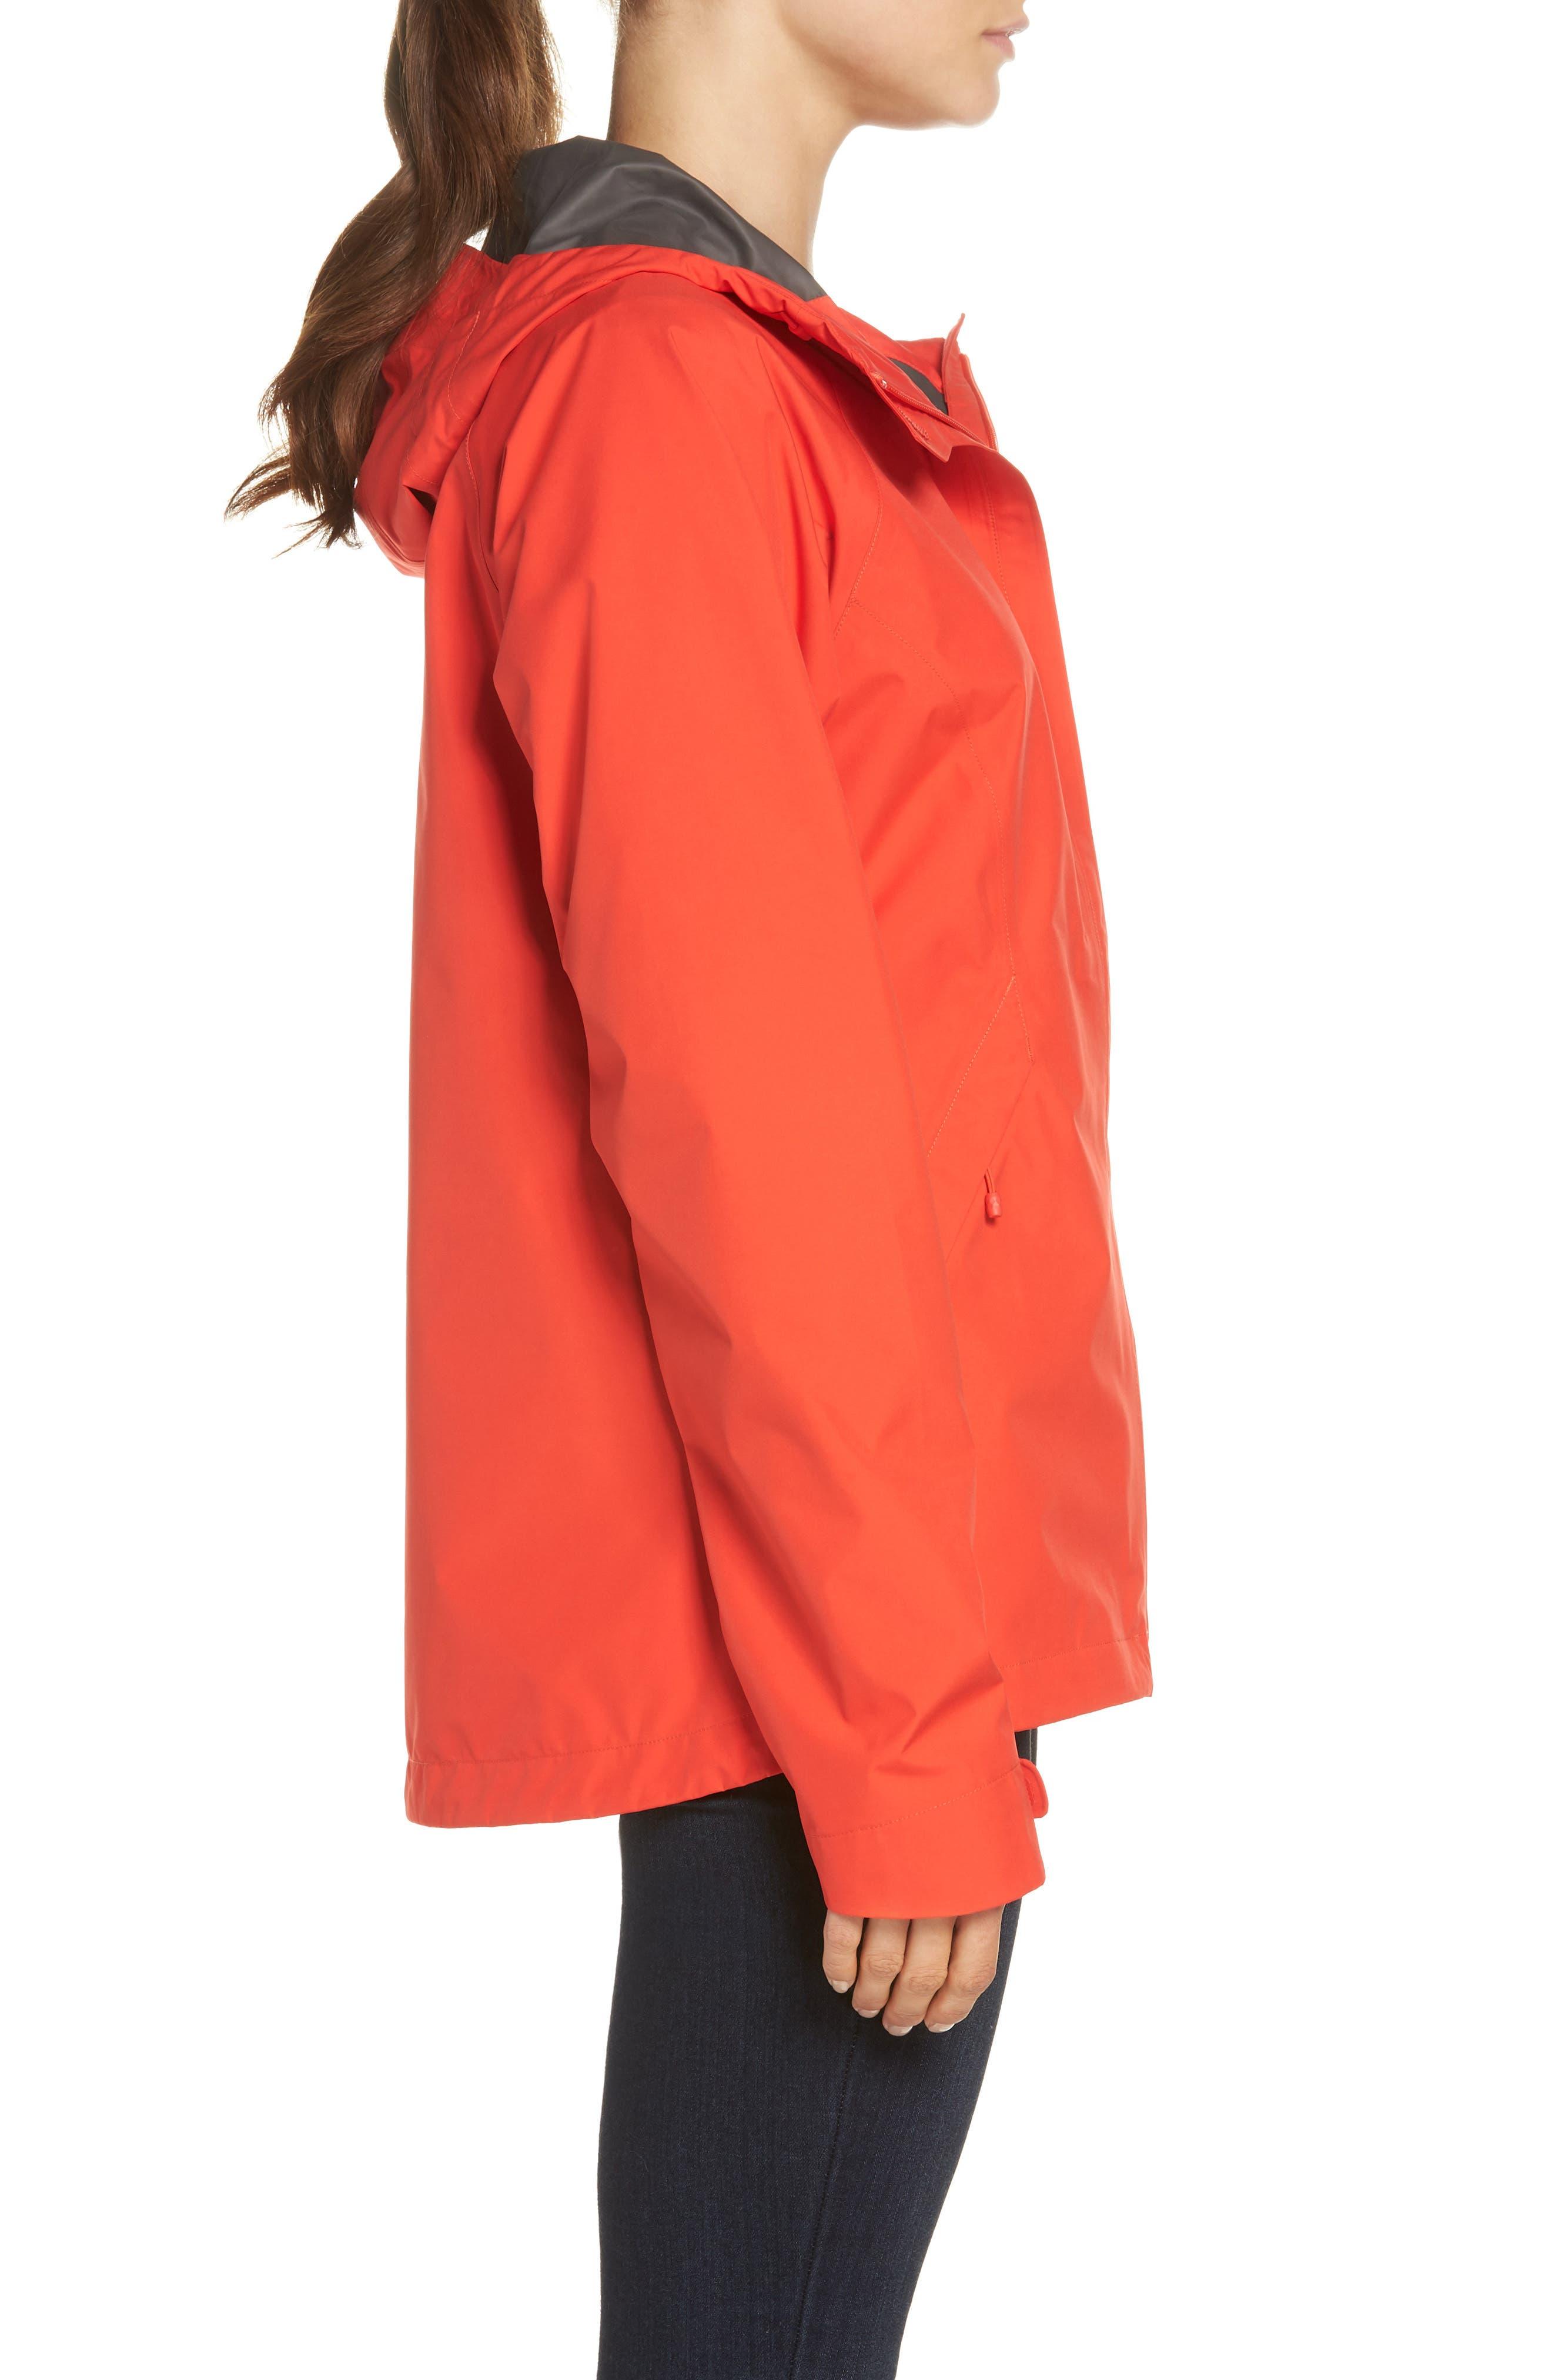 'Dryzzle' Hooded Jacket,                             Alternate thumbnail 3, color,                             JUICY RED